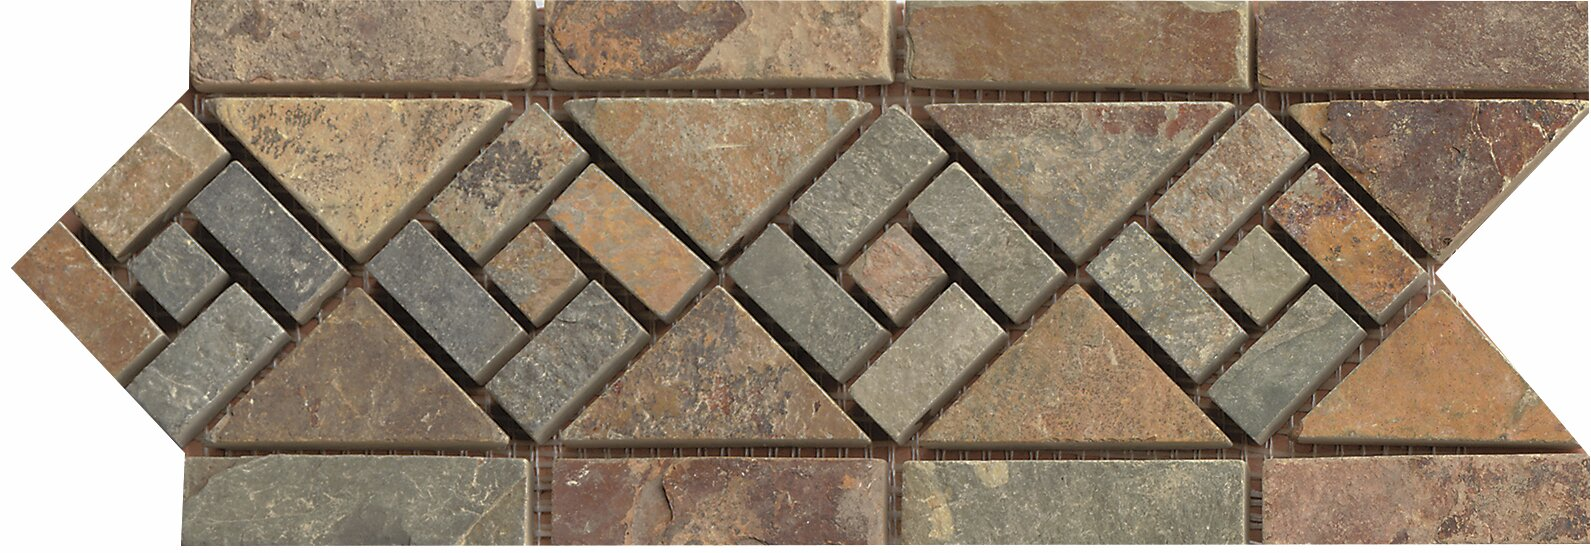 Tile Borders | The Tile Home Guide